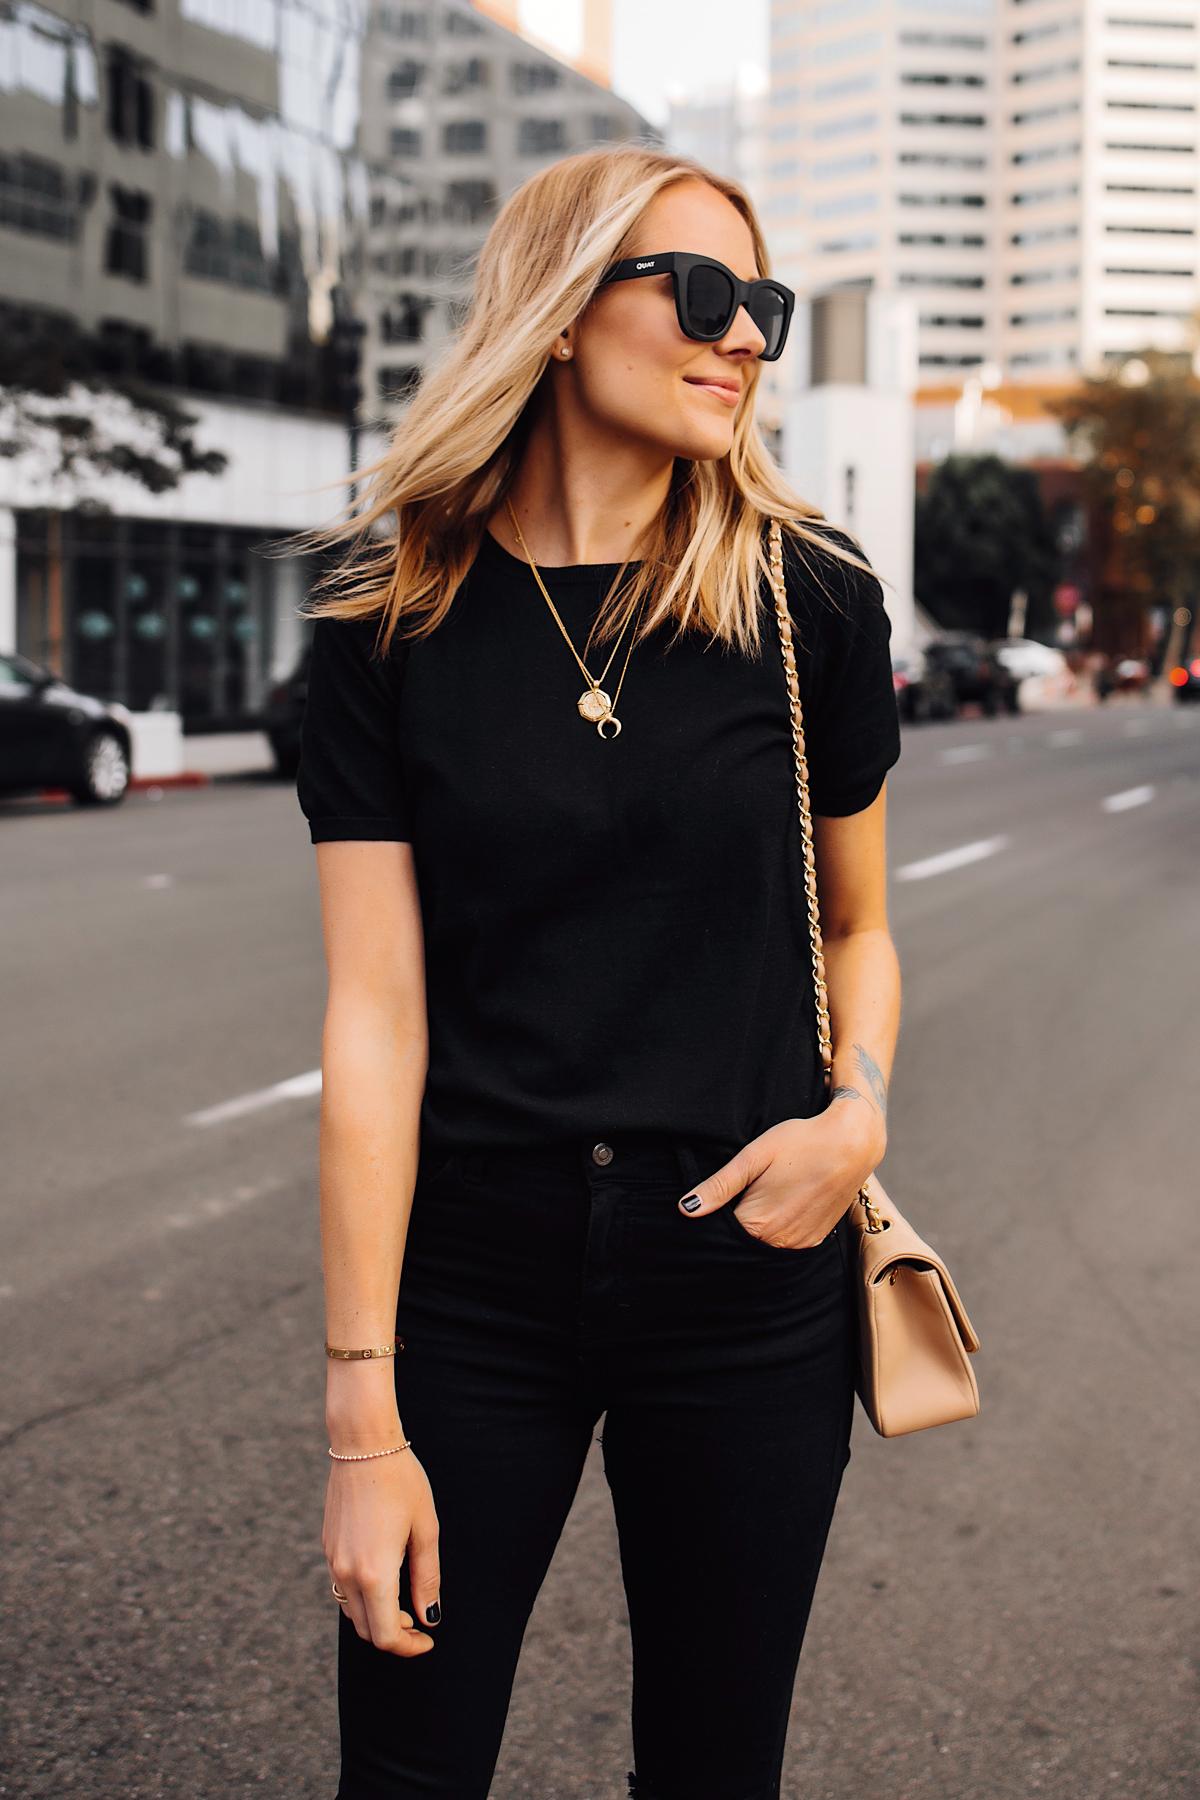 Blonde Woman Wearing Black Short Sleeve Top Black Ripped Skinny Jeans Chanel Diana Tan Handbag Gold Missoma Necklaces Fashion Jackson San Diego Fashion Blogger Street Style